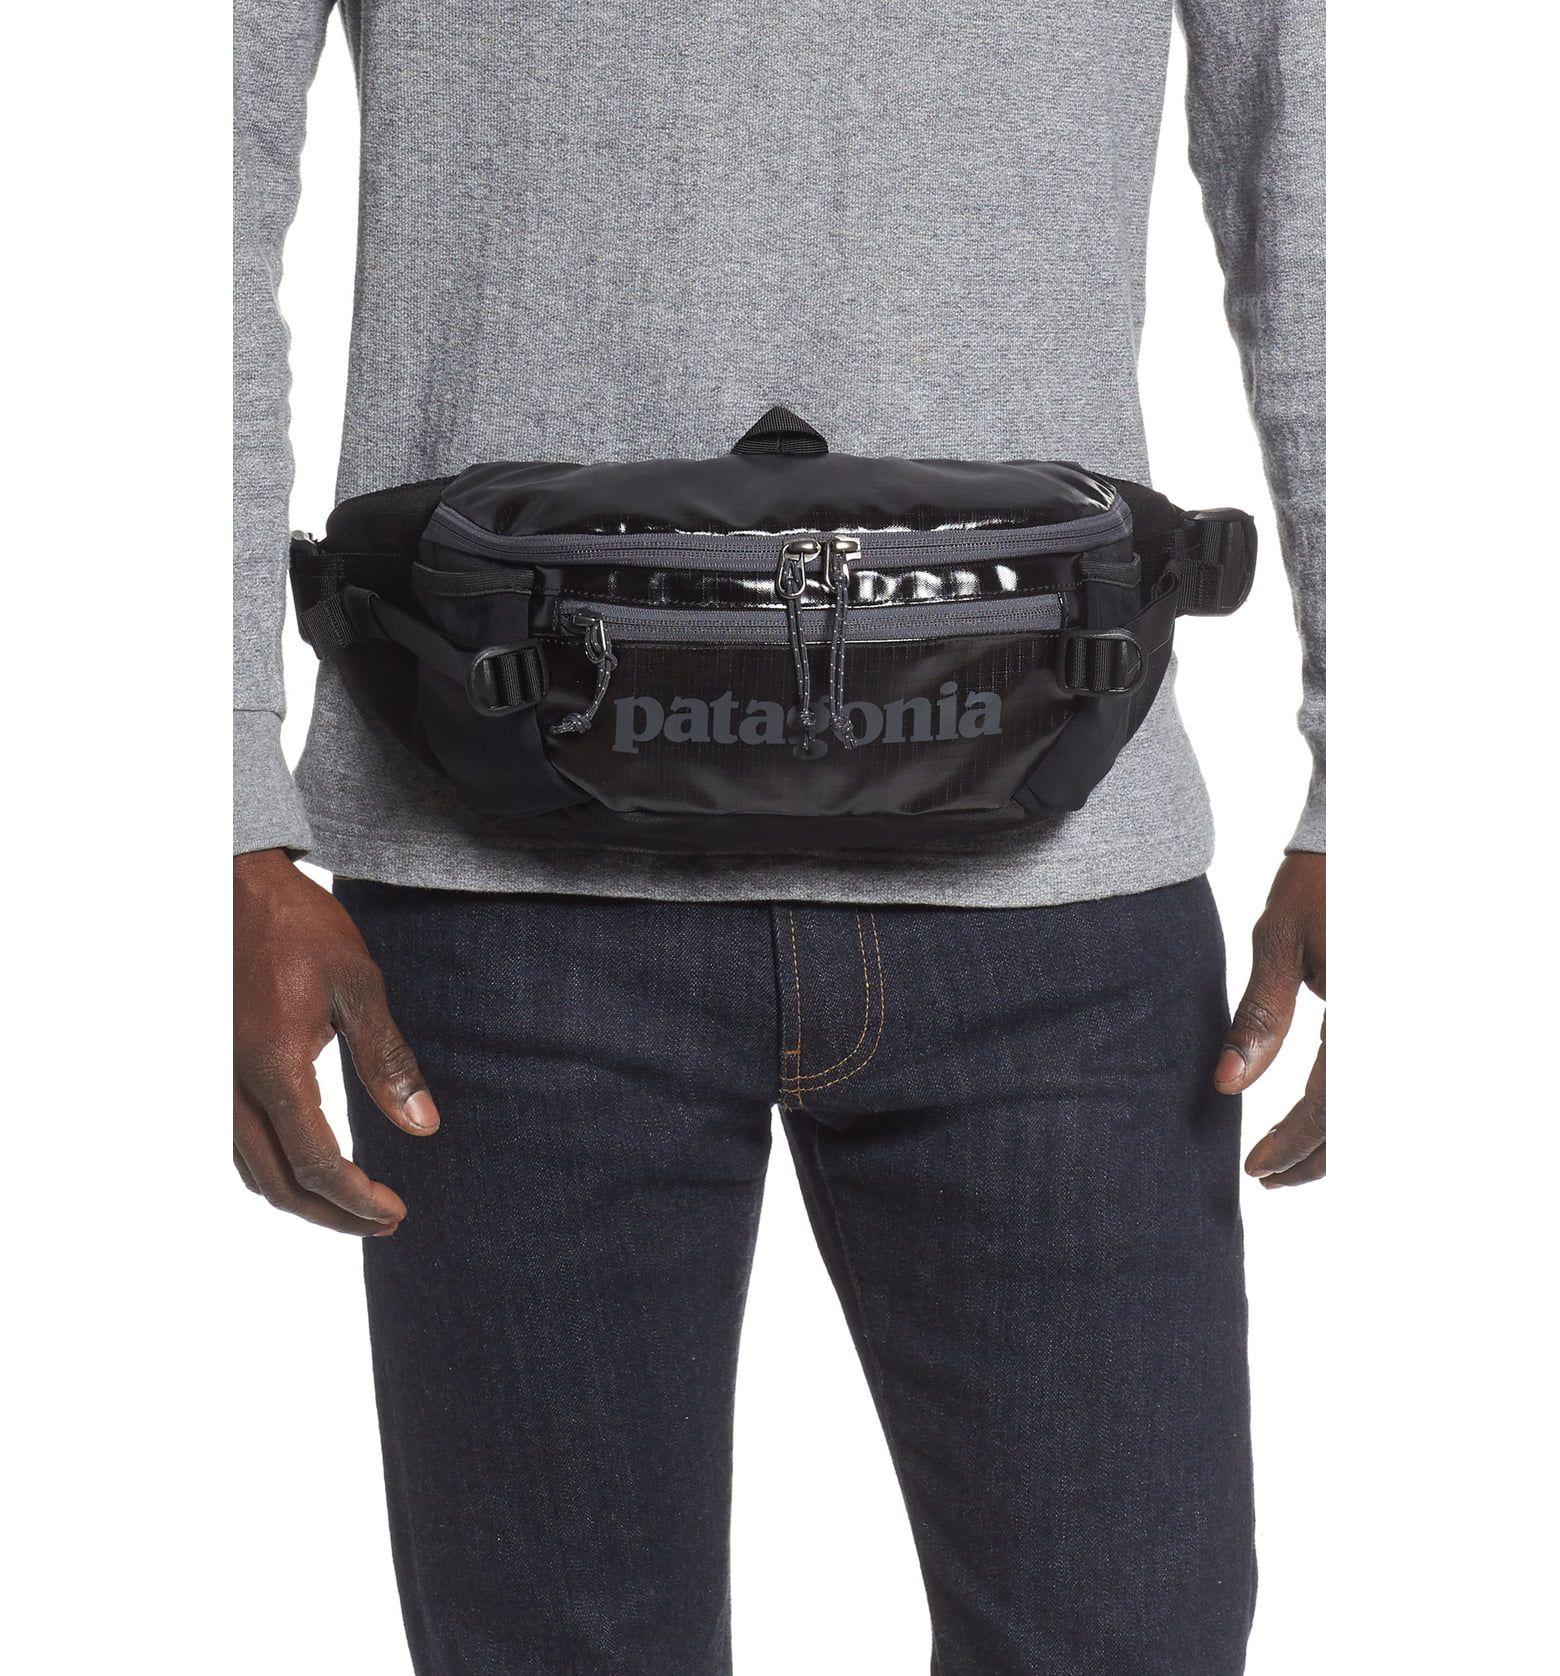 3ed62fa5c4f Patagonia Black Hole® Belt Bag | Nordstrom | Travel Gear | Bags ...